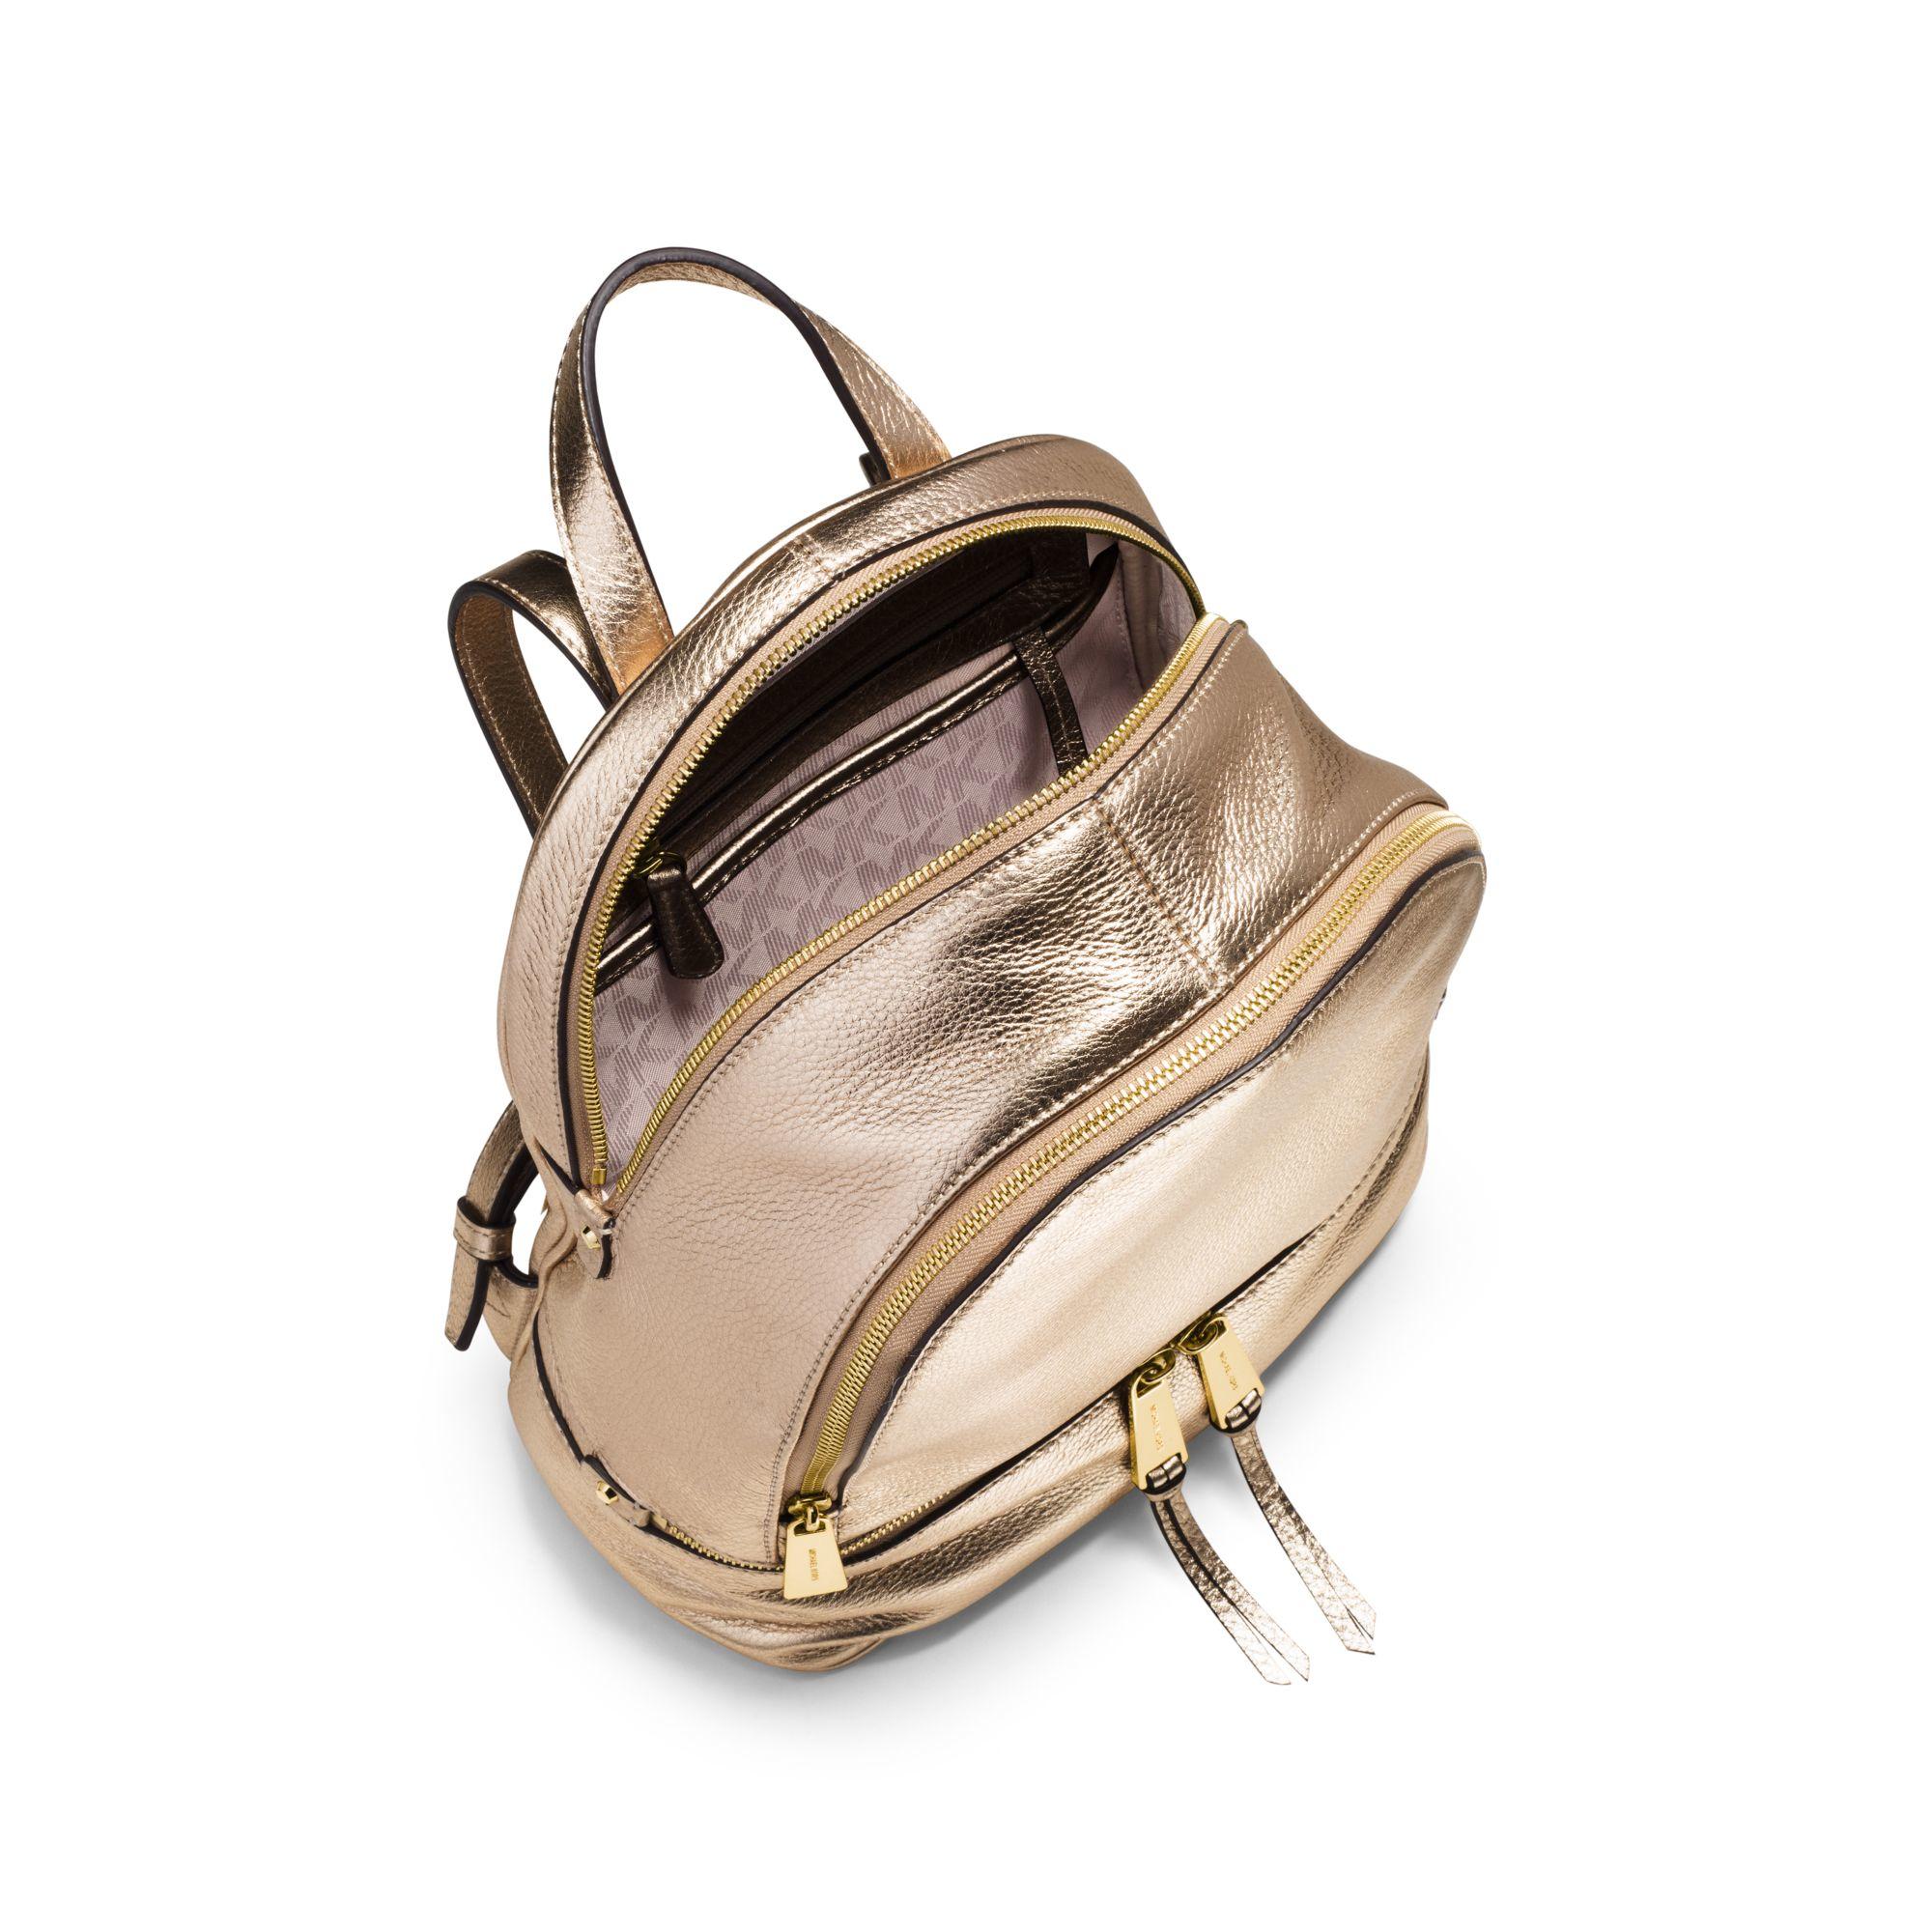 60ee3b76b71b Lyst - Michael Kors Rhea Metallic Medium Backpack in Metallic